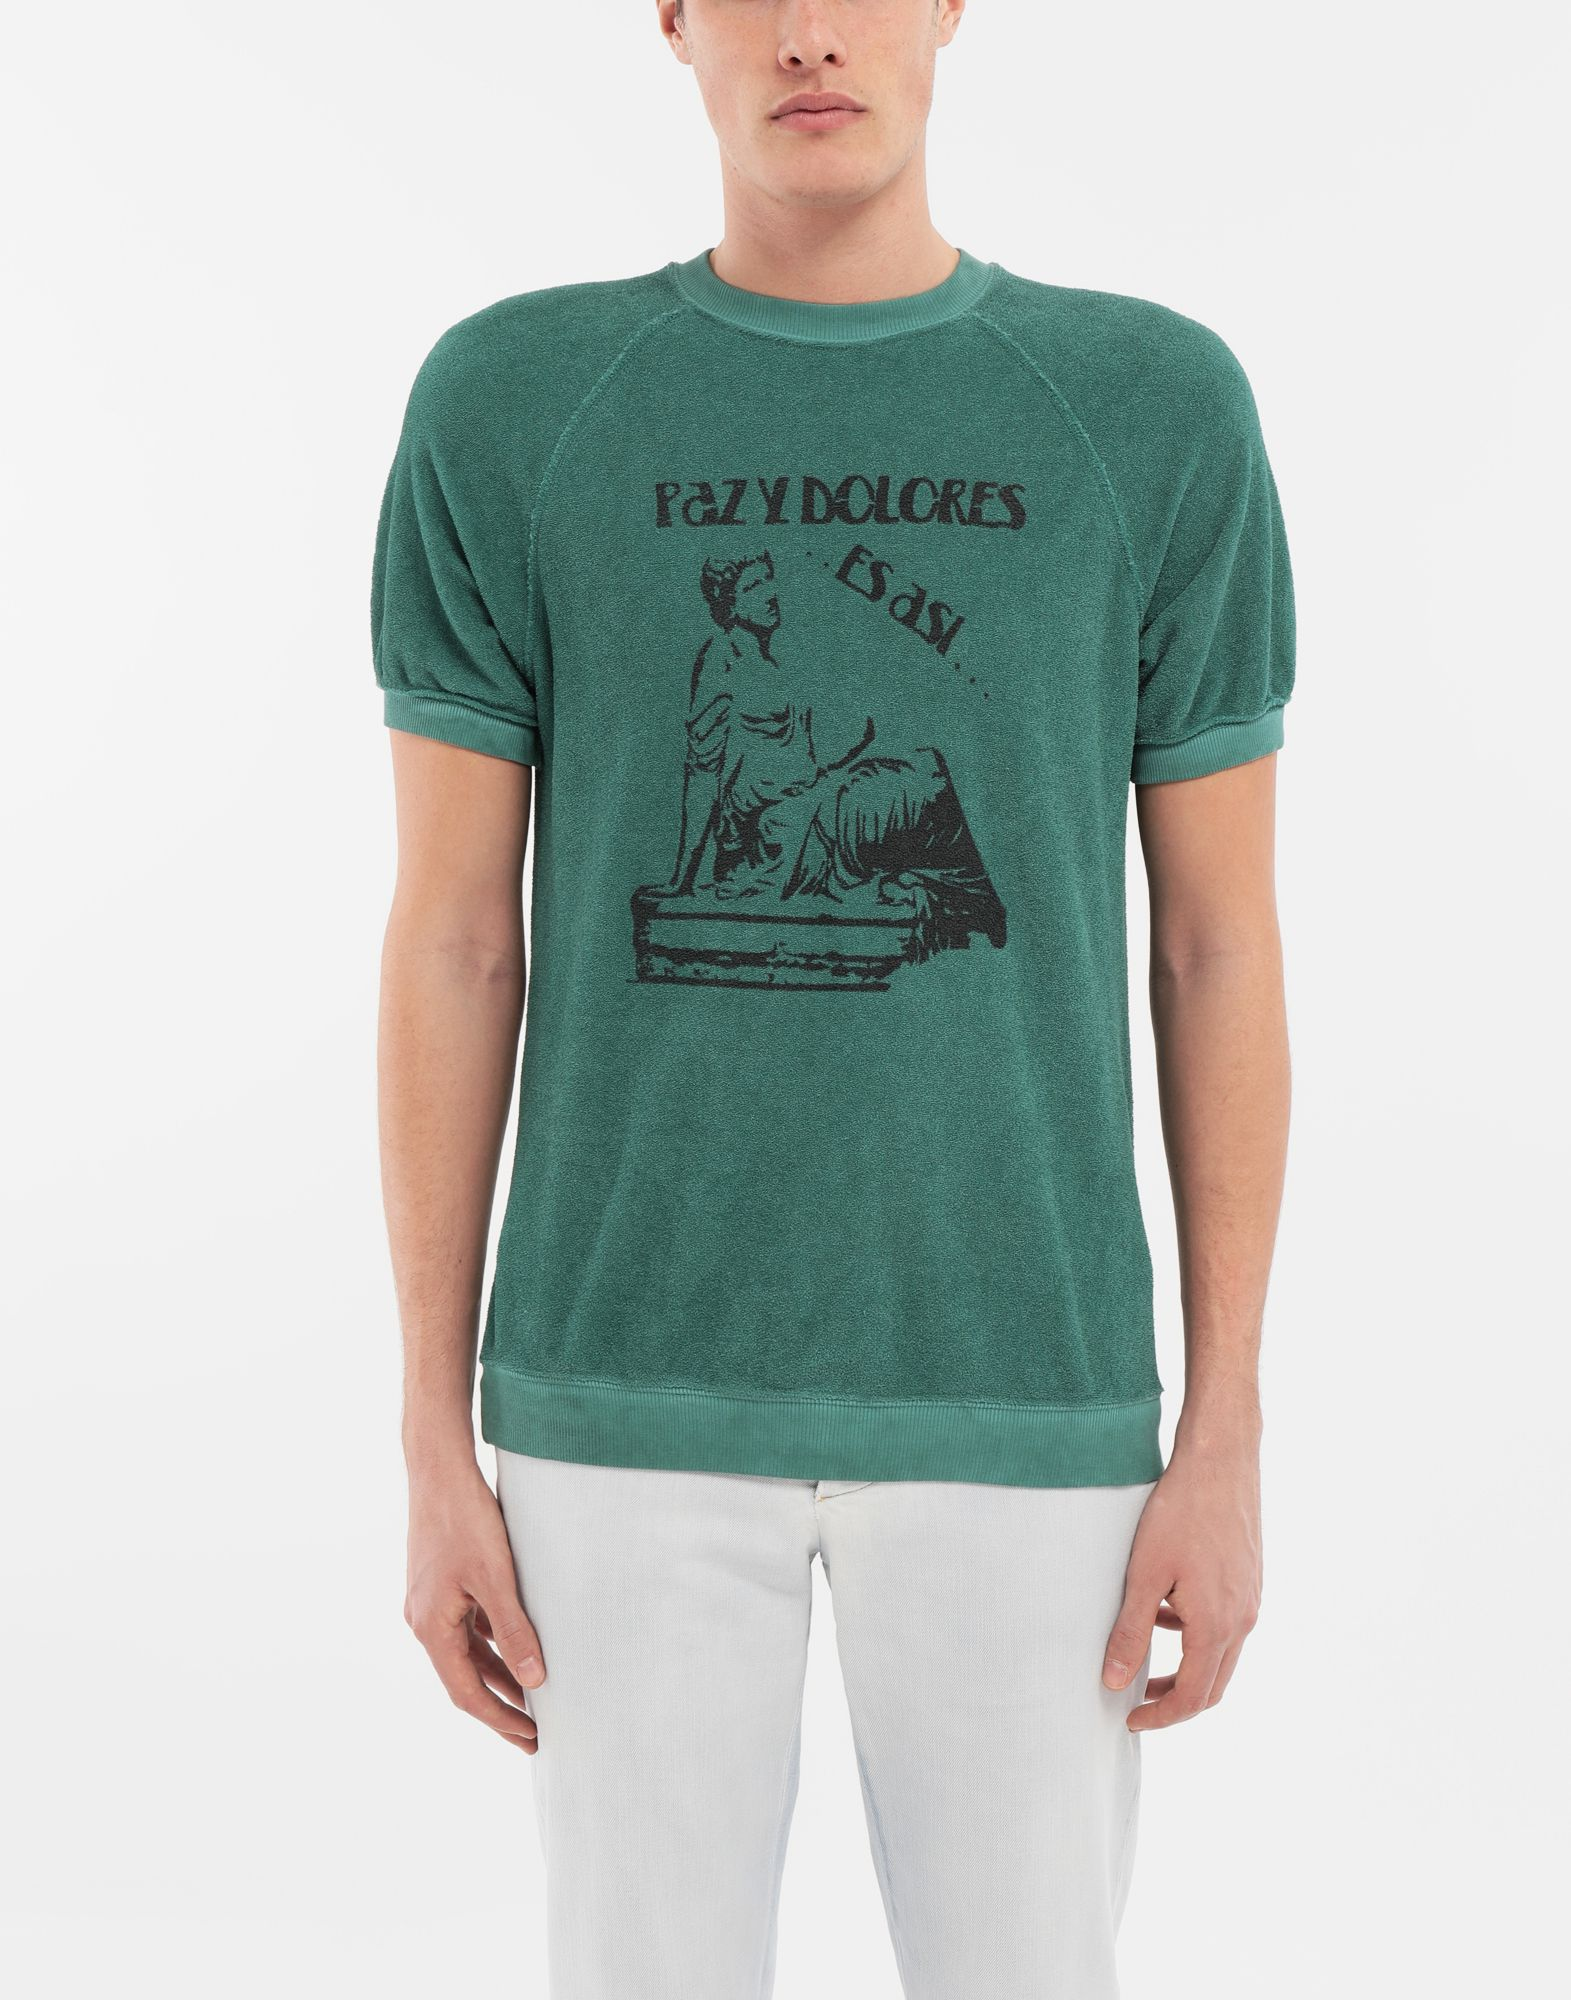 MAISON MARGIELA Graphic printed faded T-shirt Sweatshirt Man r